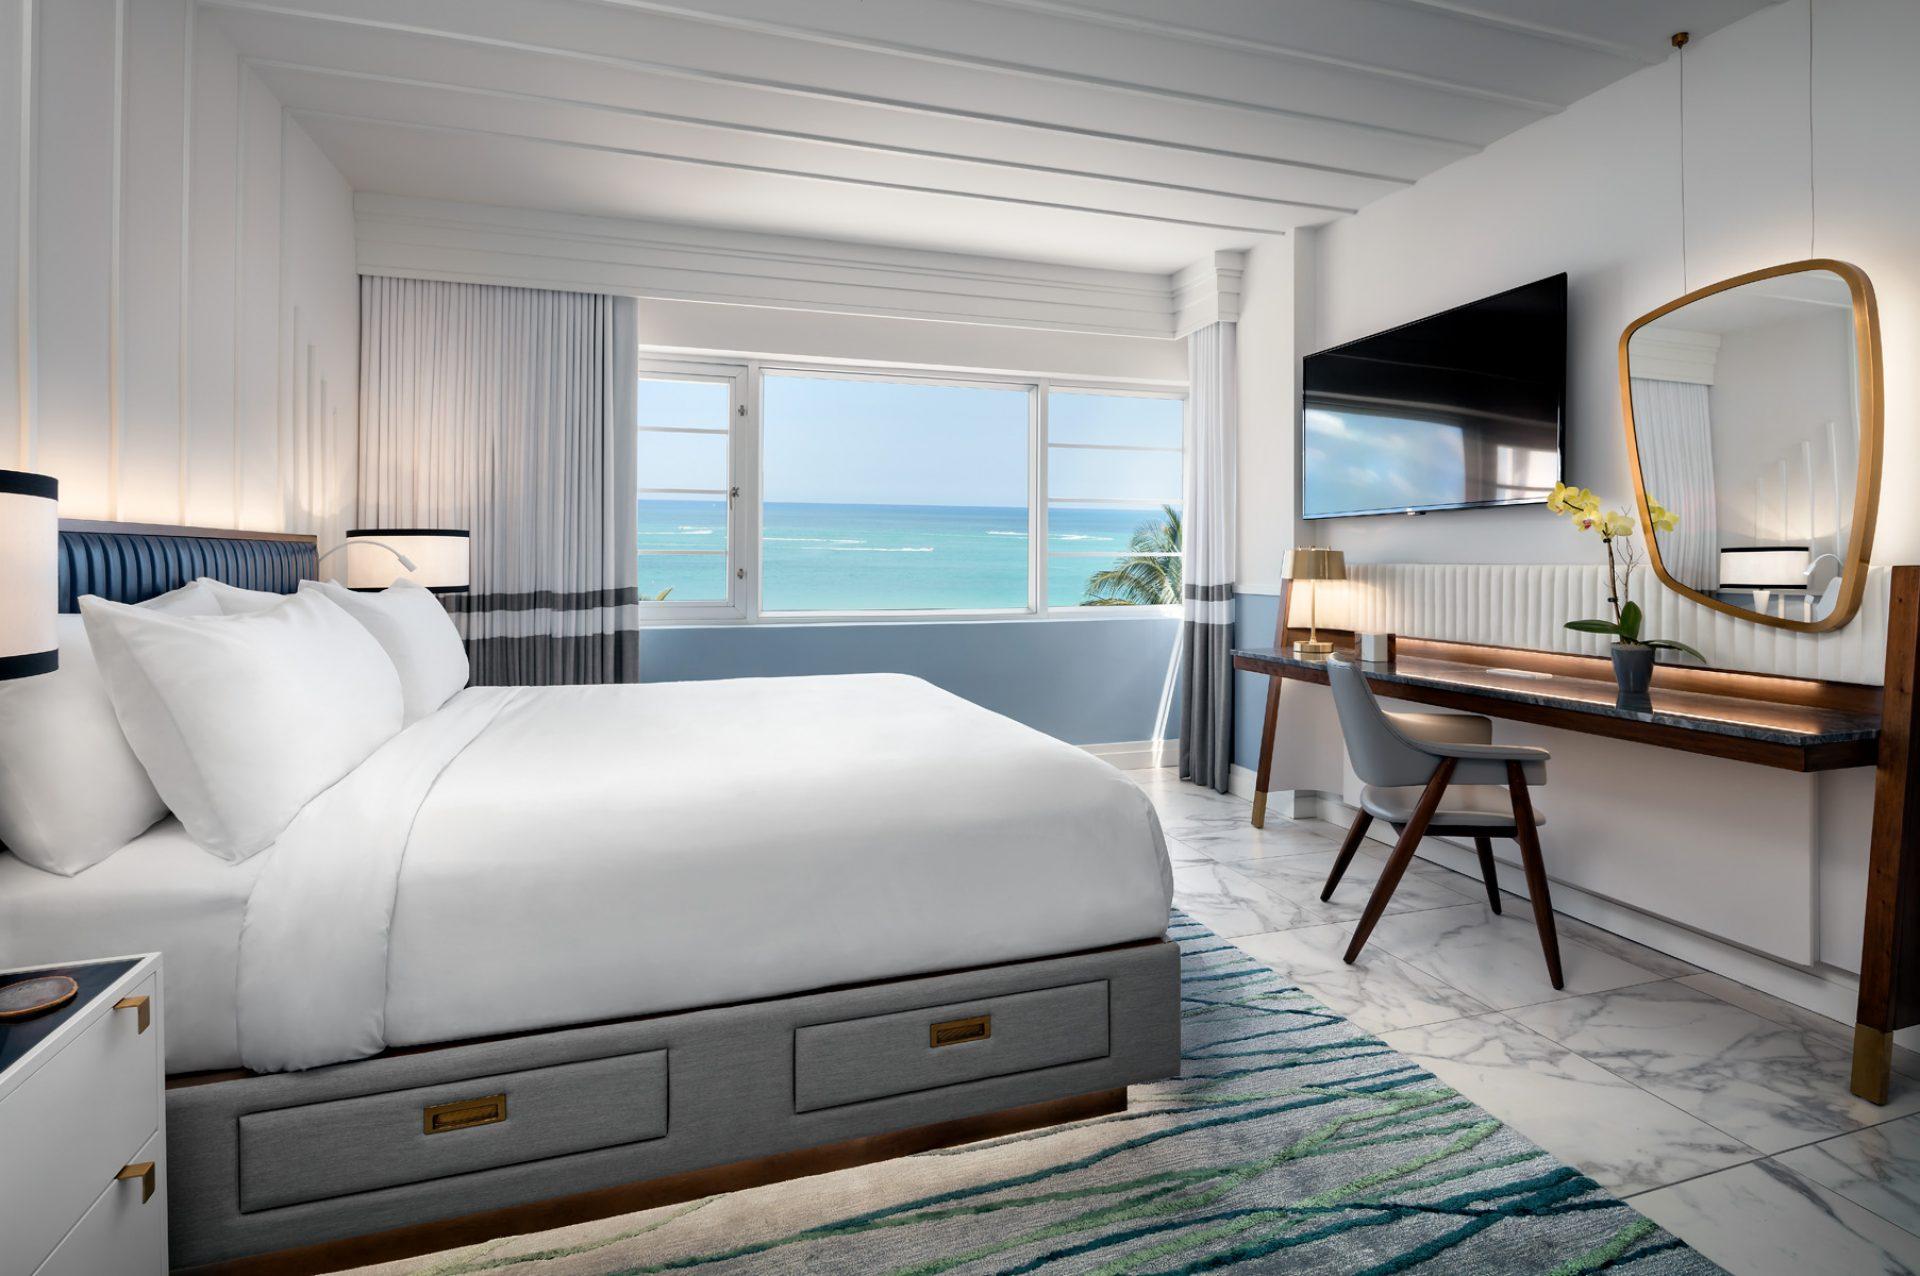 Cadillac Hotel & Beach Club, Autograph Collection - Miami Beach, FL